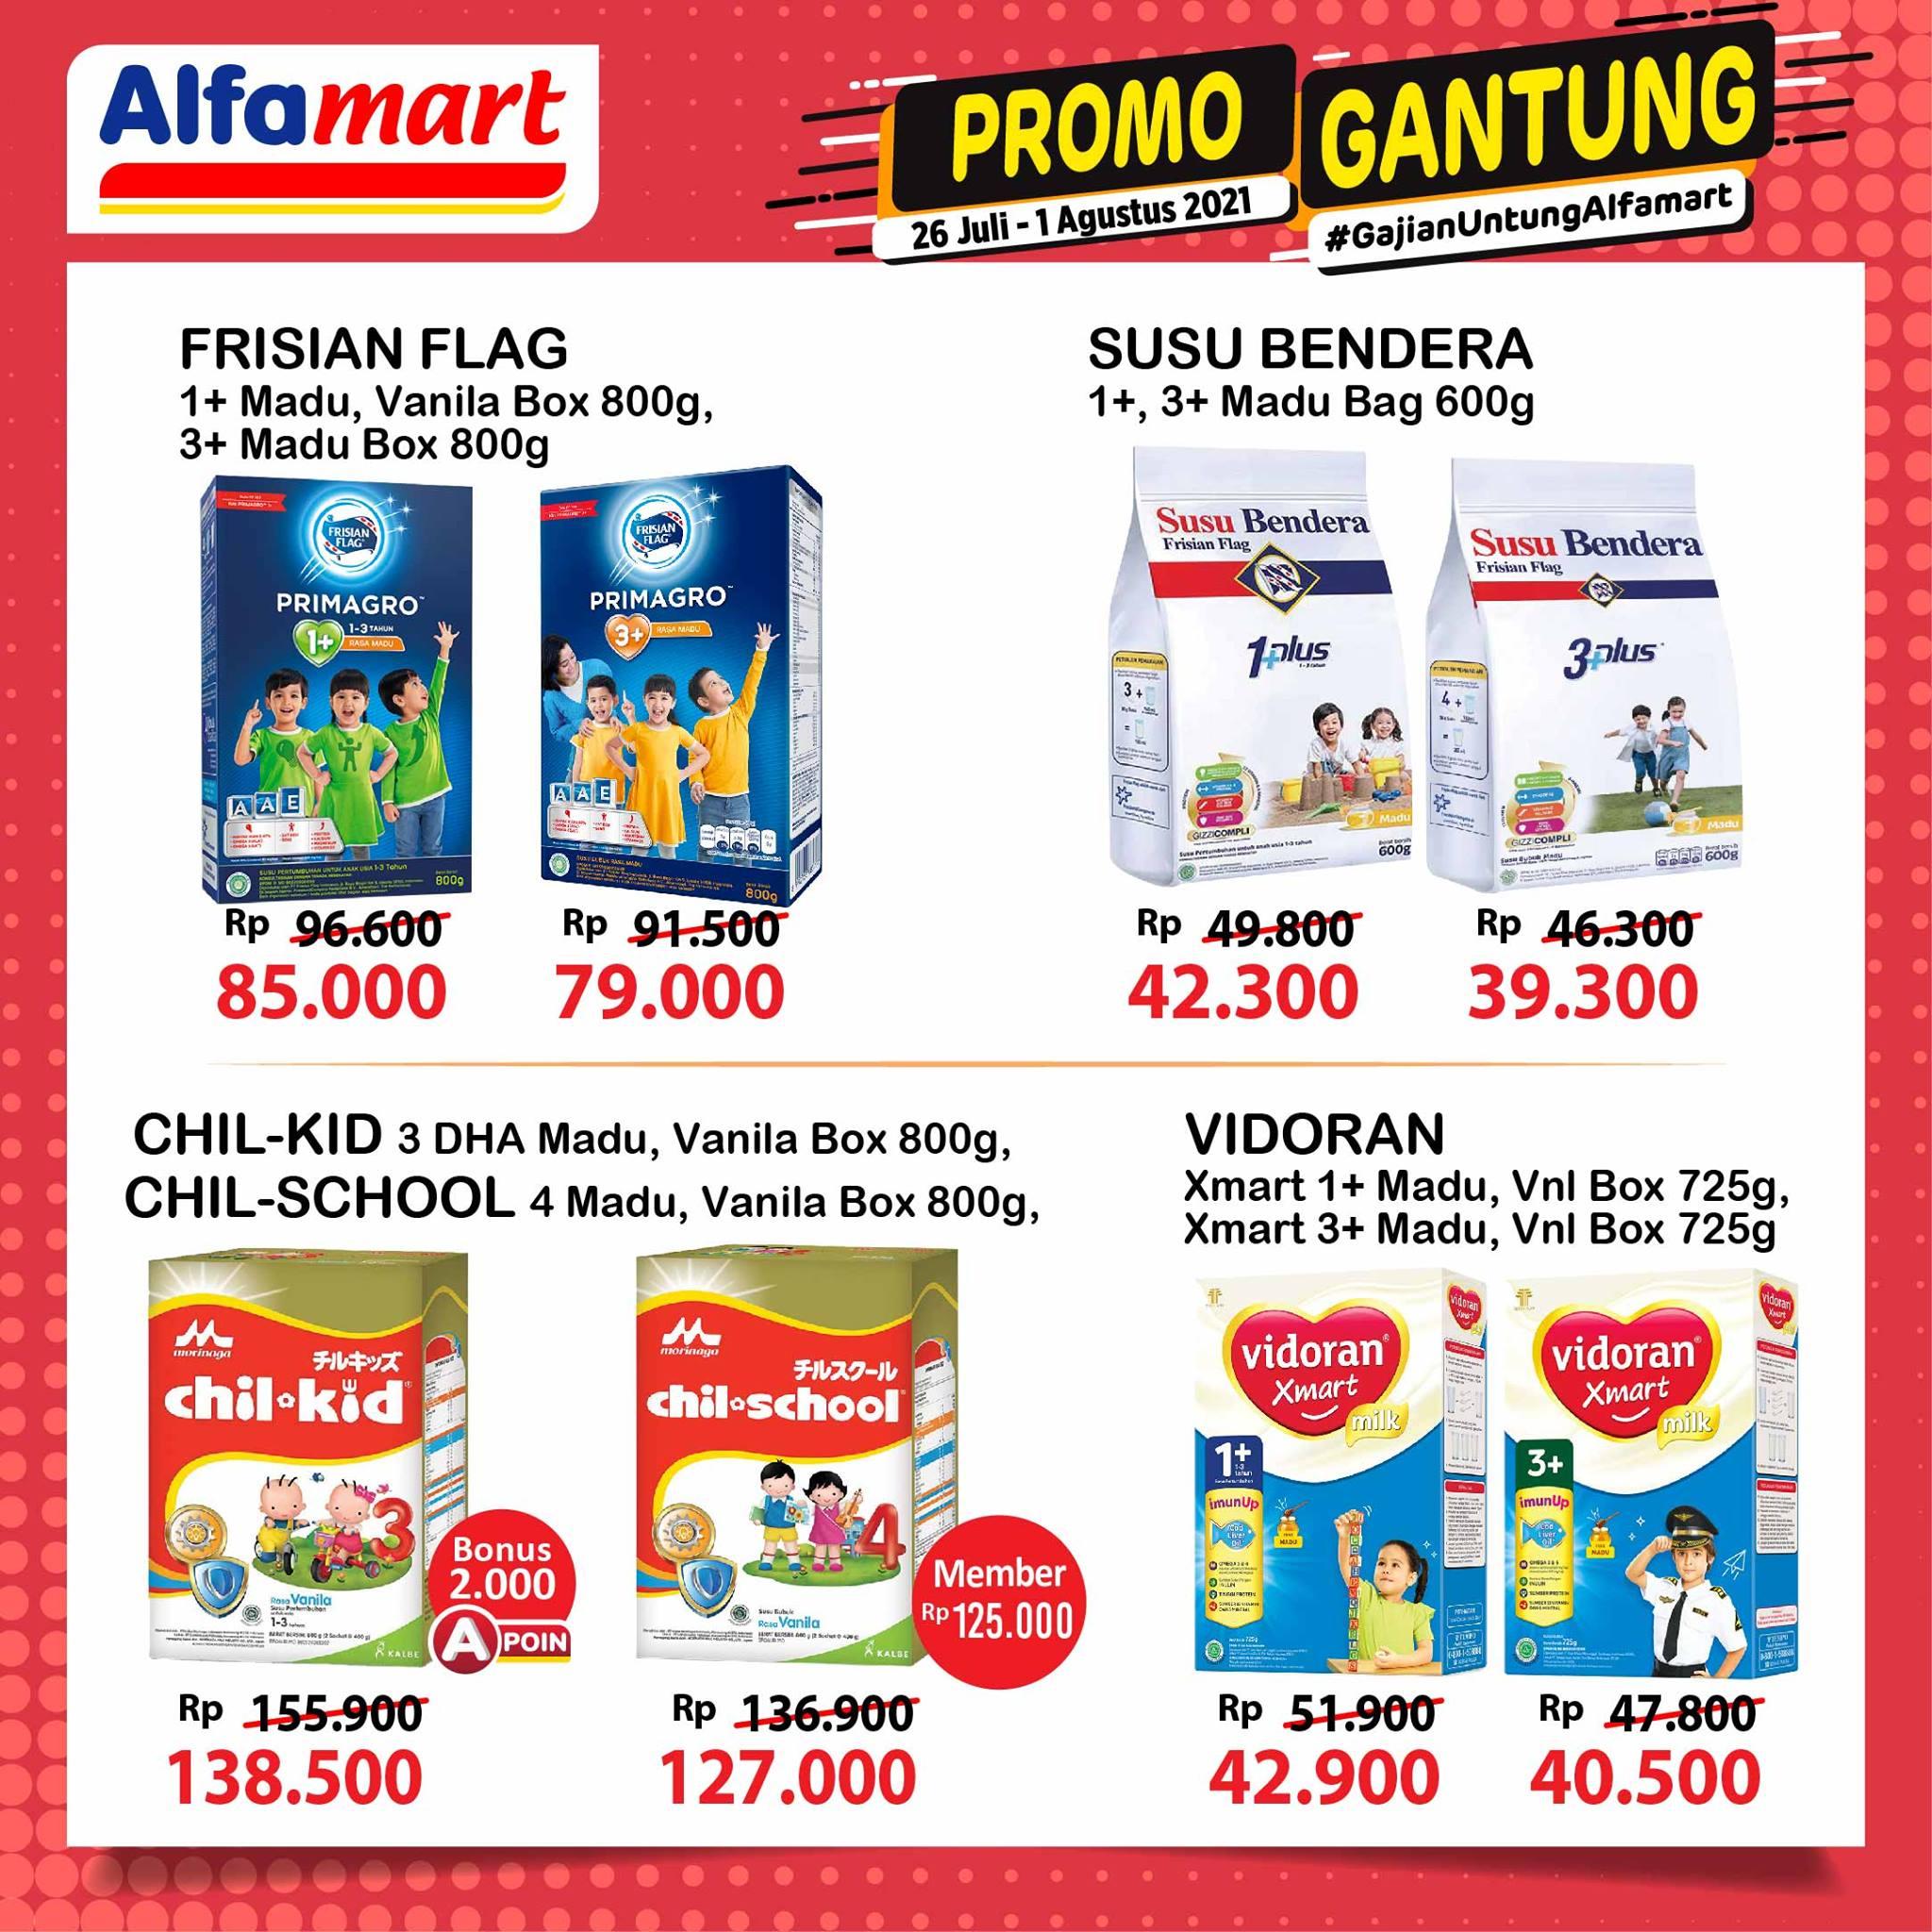 Promo GANTUNG ALFAMART / GAJIAN UNTUNG periode 26 Juli - 01 Agustus 2021